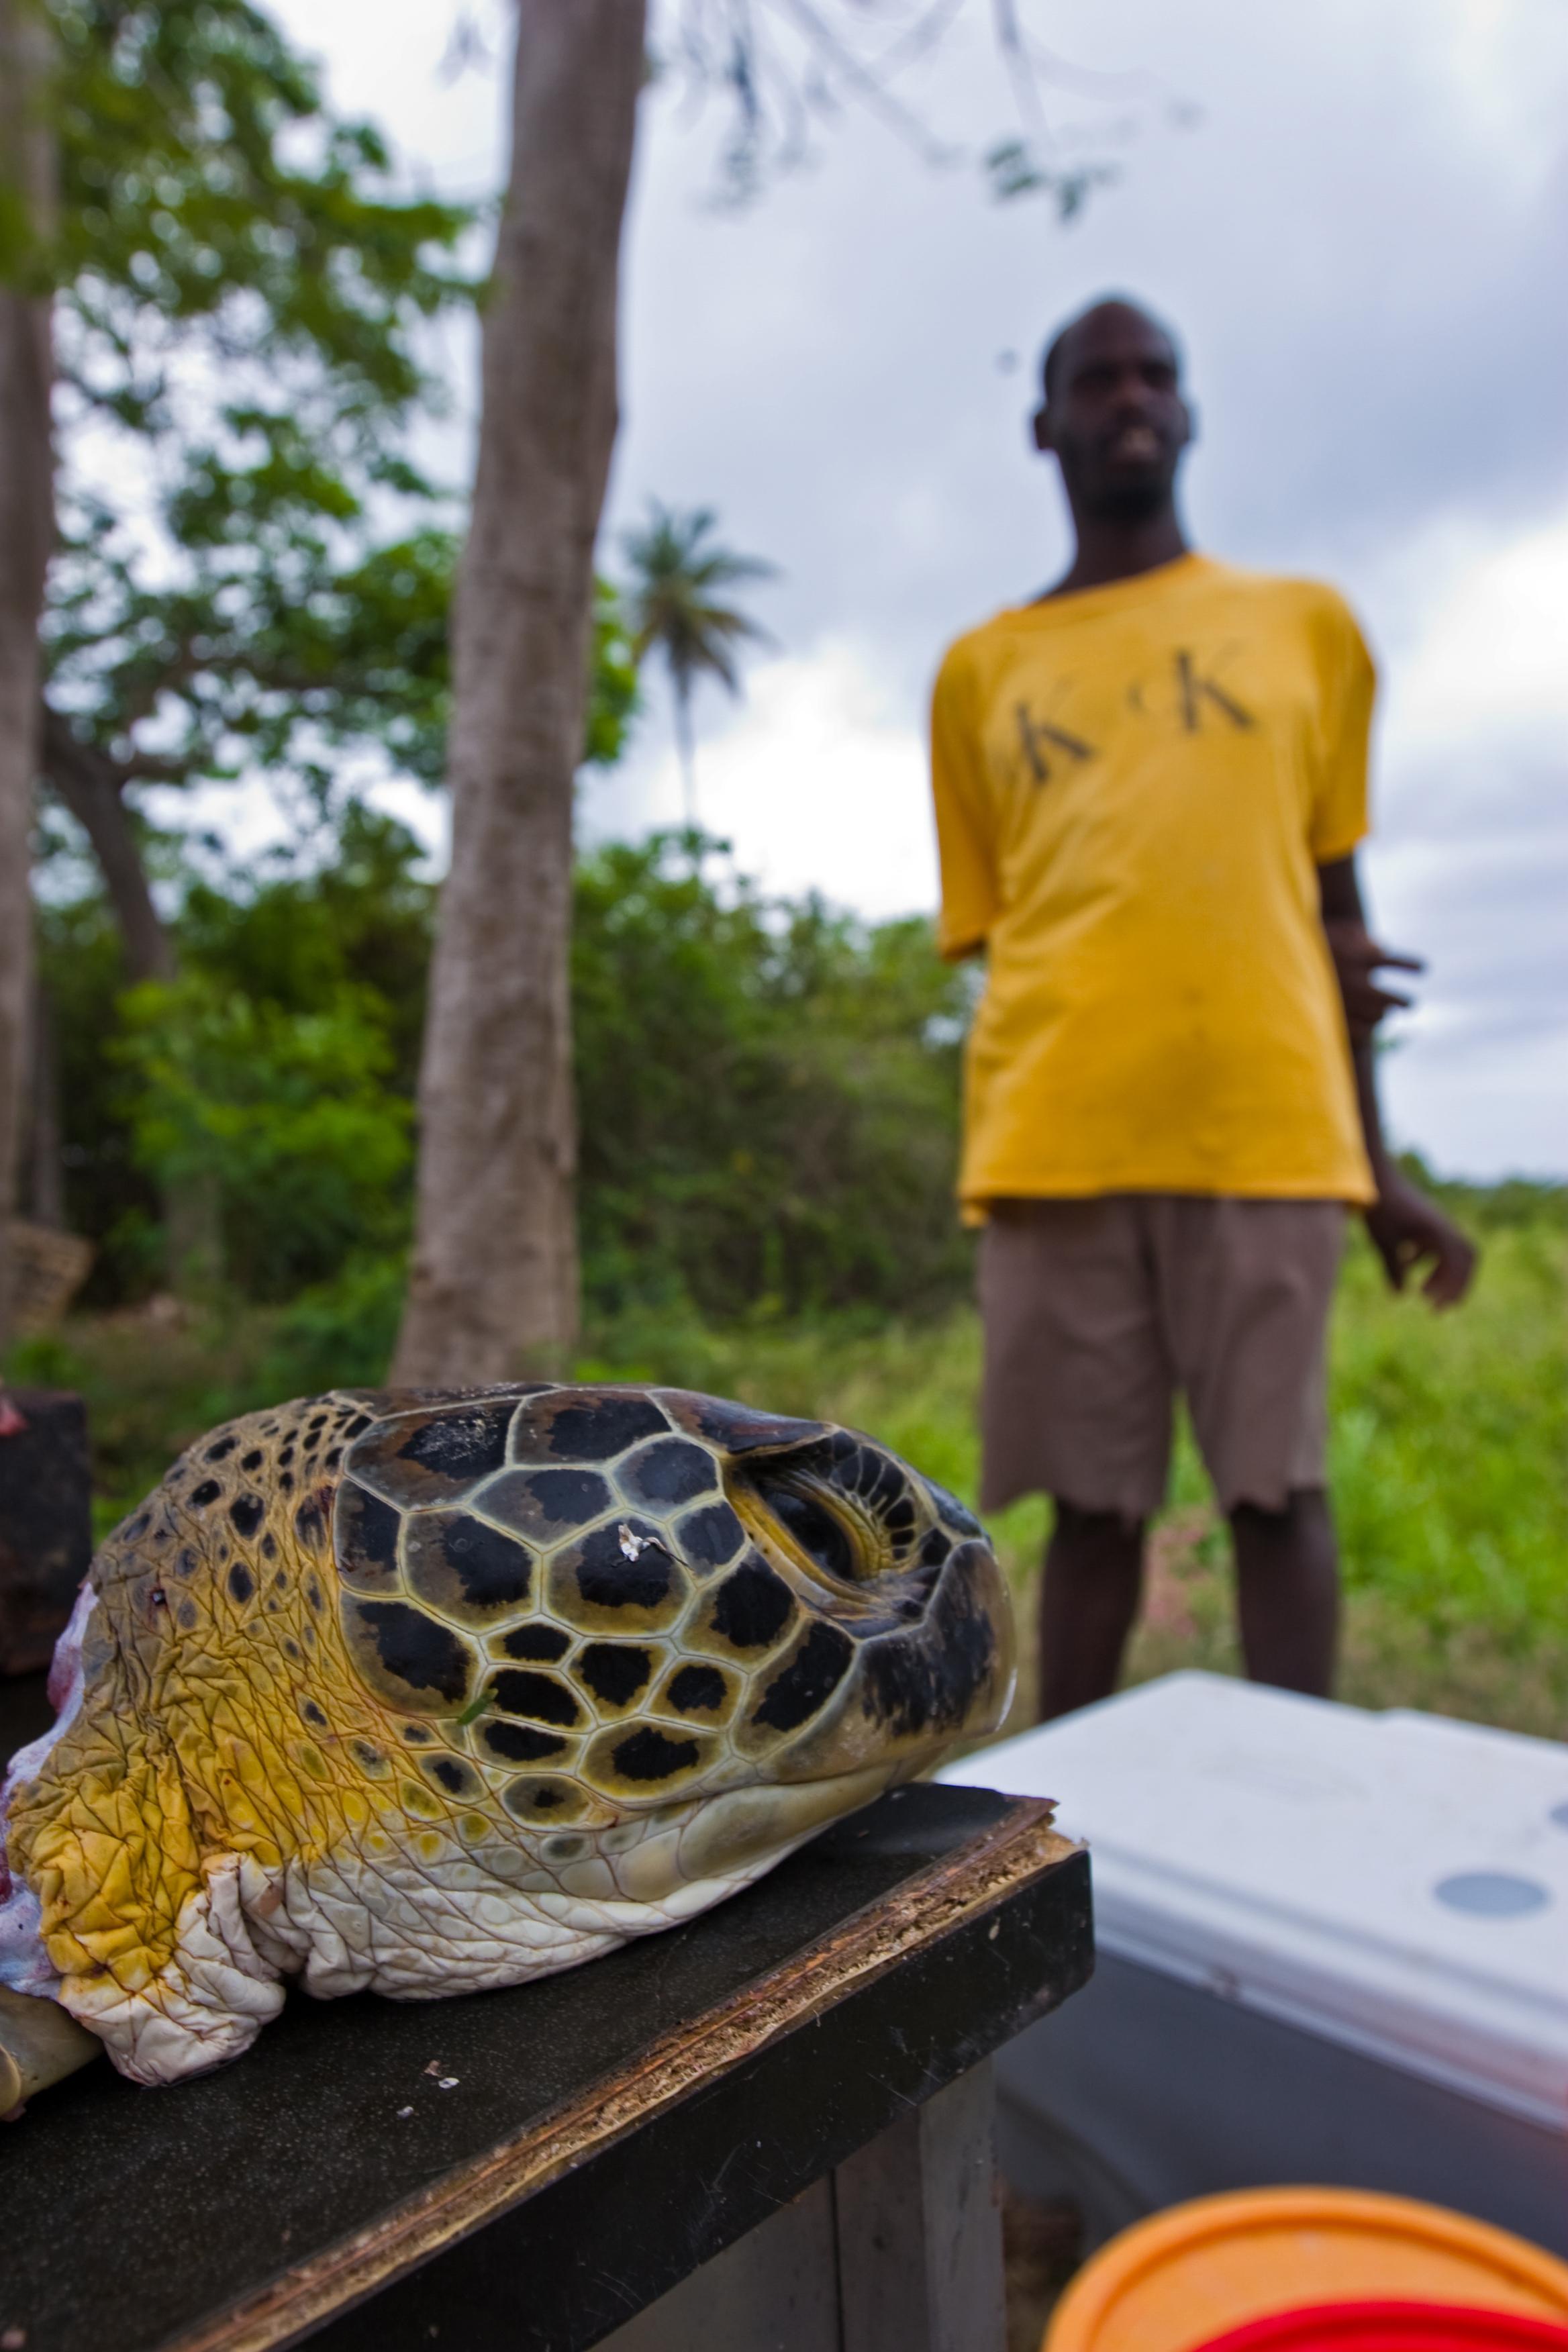 A butchered green turtle for sale in Grenada. © Brian J. Hutchinson